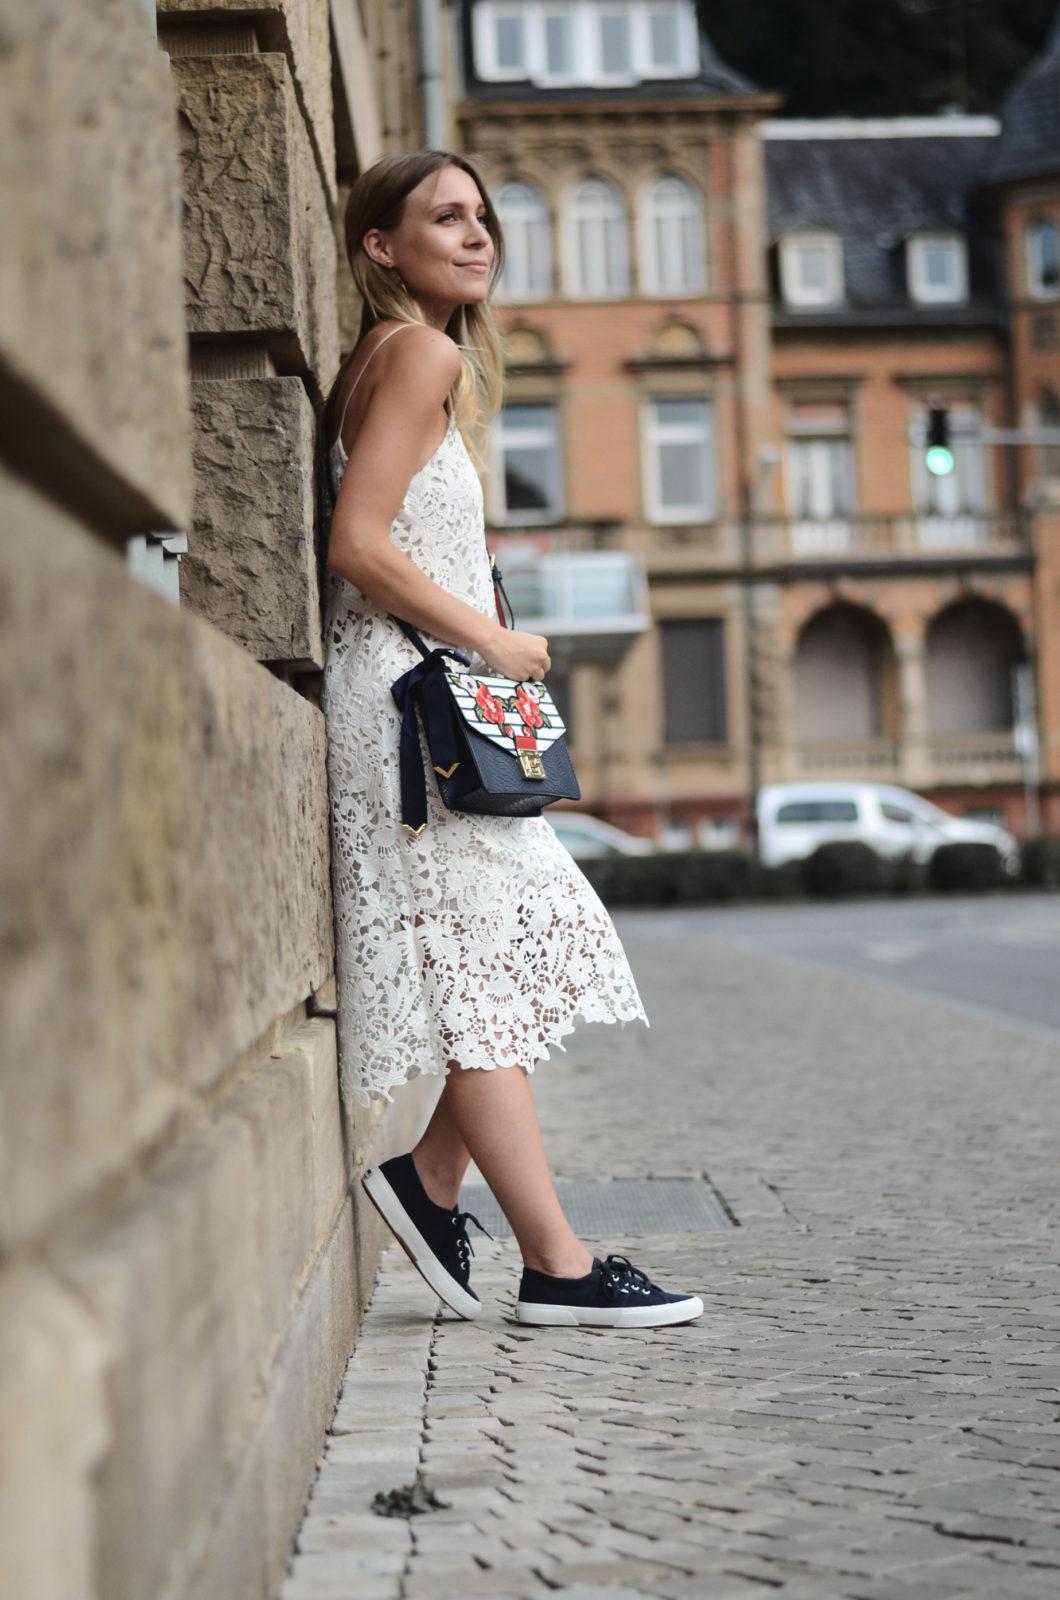 Sariety-modeblog-heidelberg-sarah-czok-fashionblogger-zara-spitzenkleid-superga-aldo-bag-9